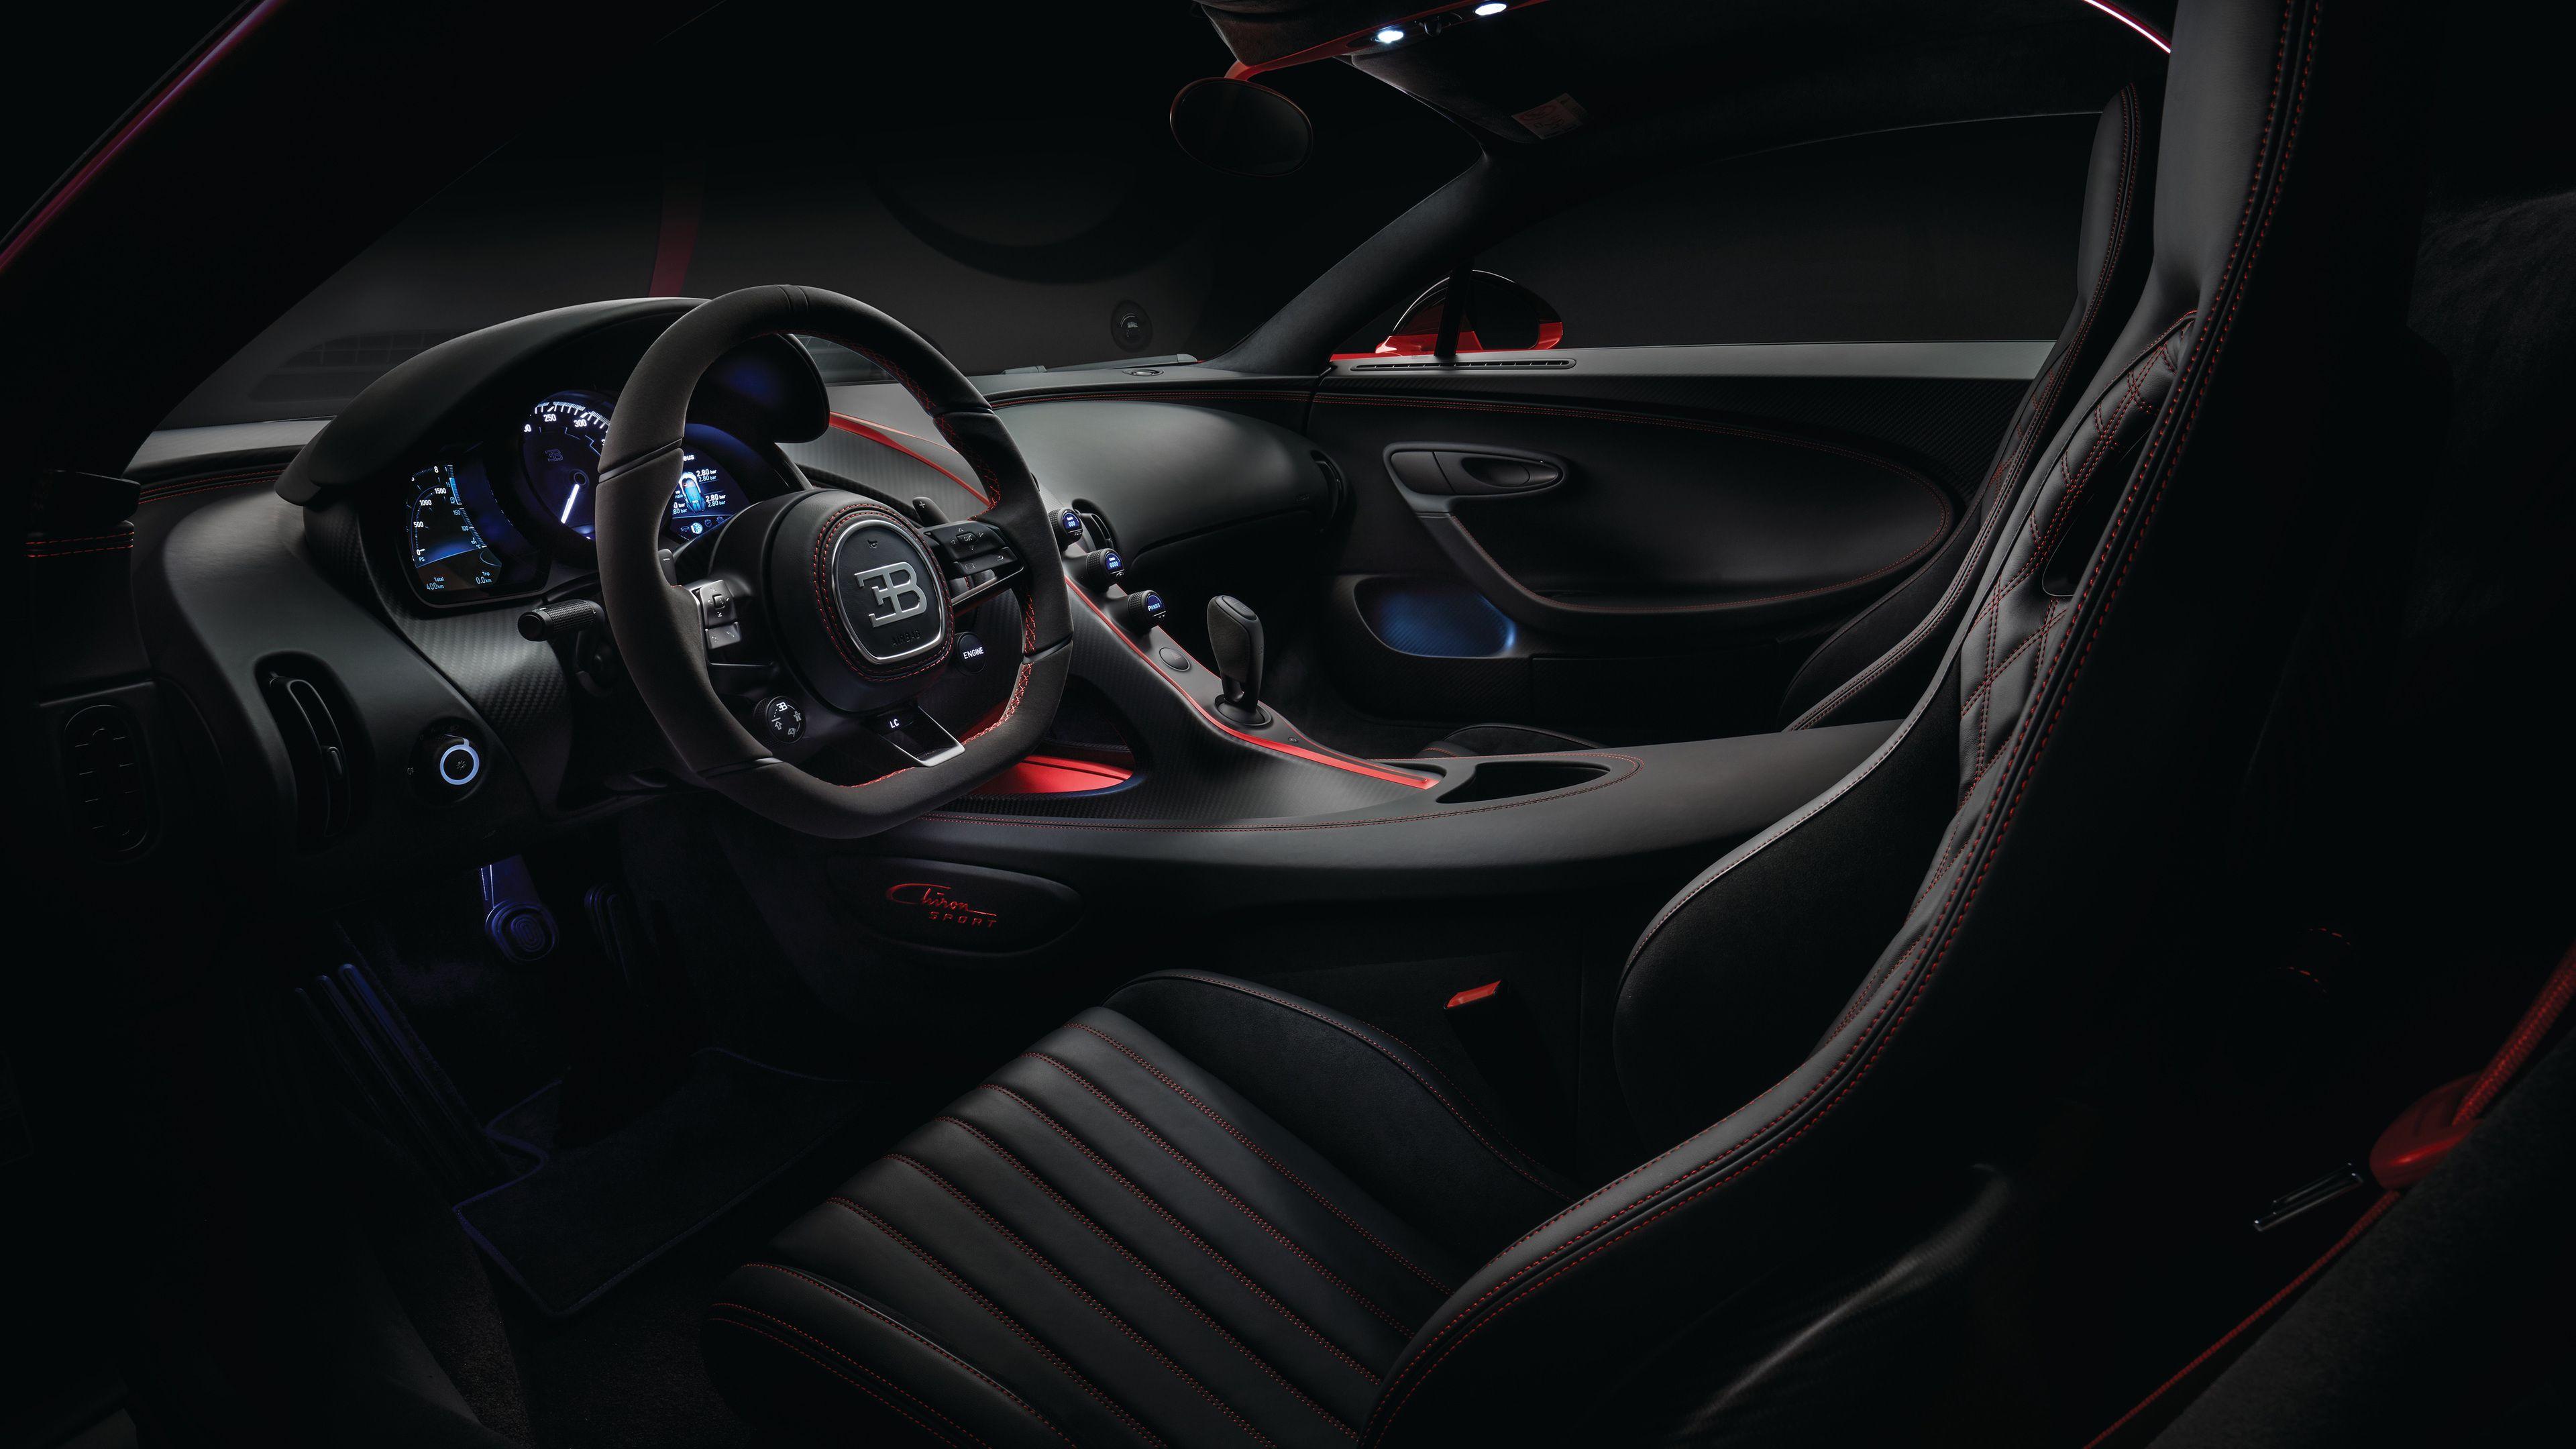 Bugatti Chiron Interior 2018 4k Interior Wallpapers Hd Wallpapers Cars Wallpapers Bugatti Wallpape Bugatti Wallpapers Bugatti Chiron Interior Bugatti Chiron